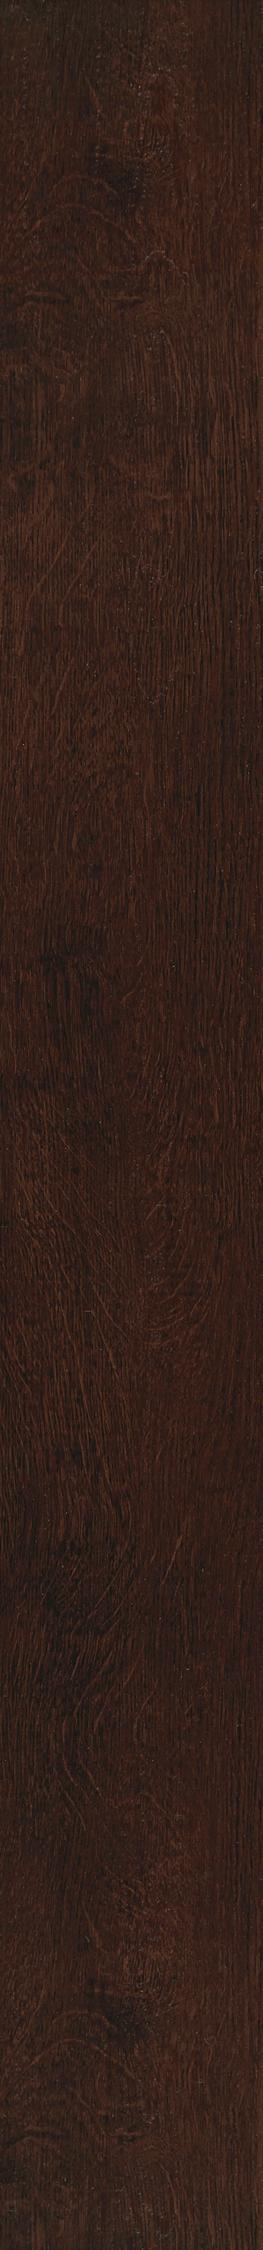 Blue Mountain Flooring In Hendersonville NC 28739